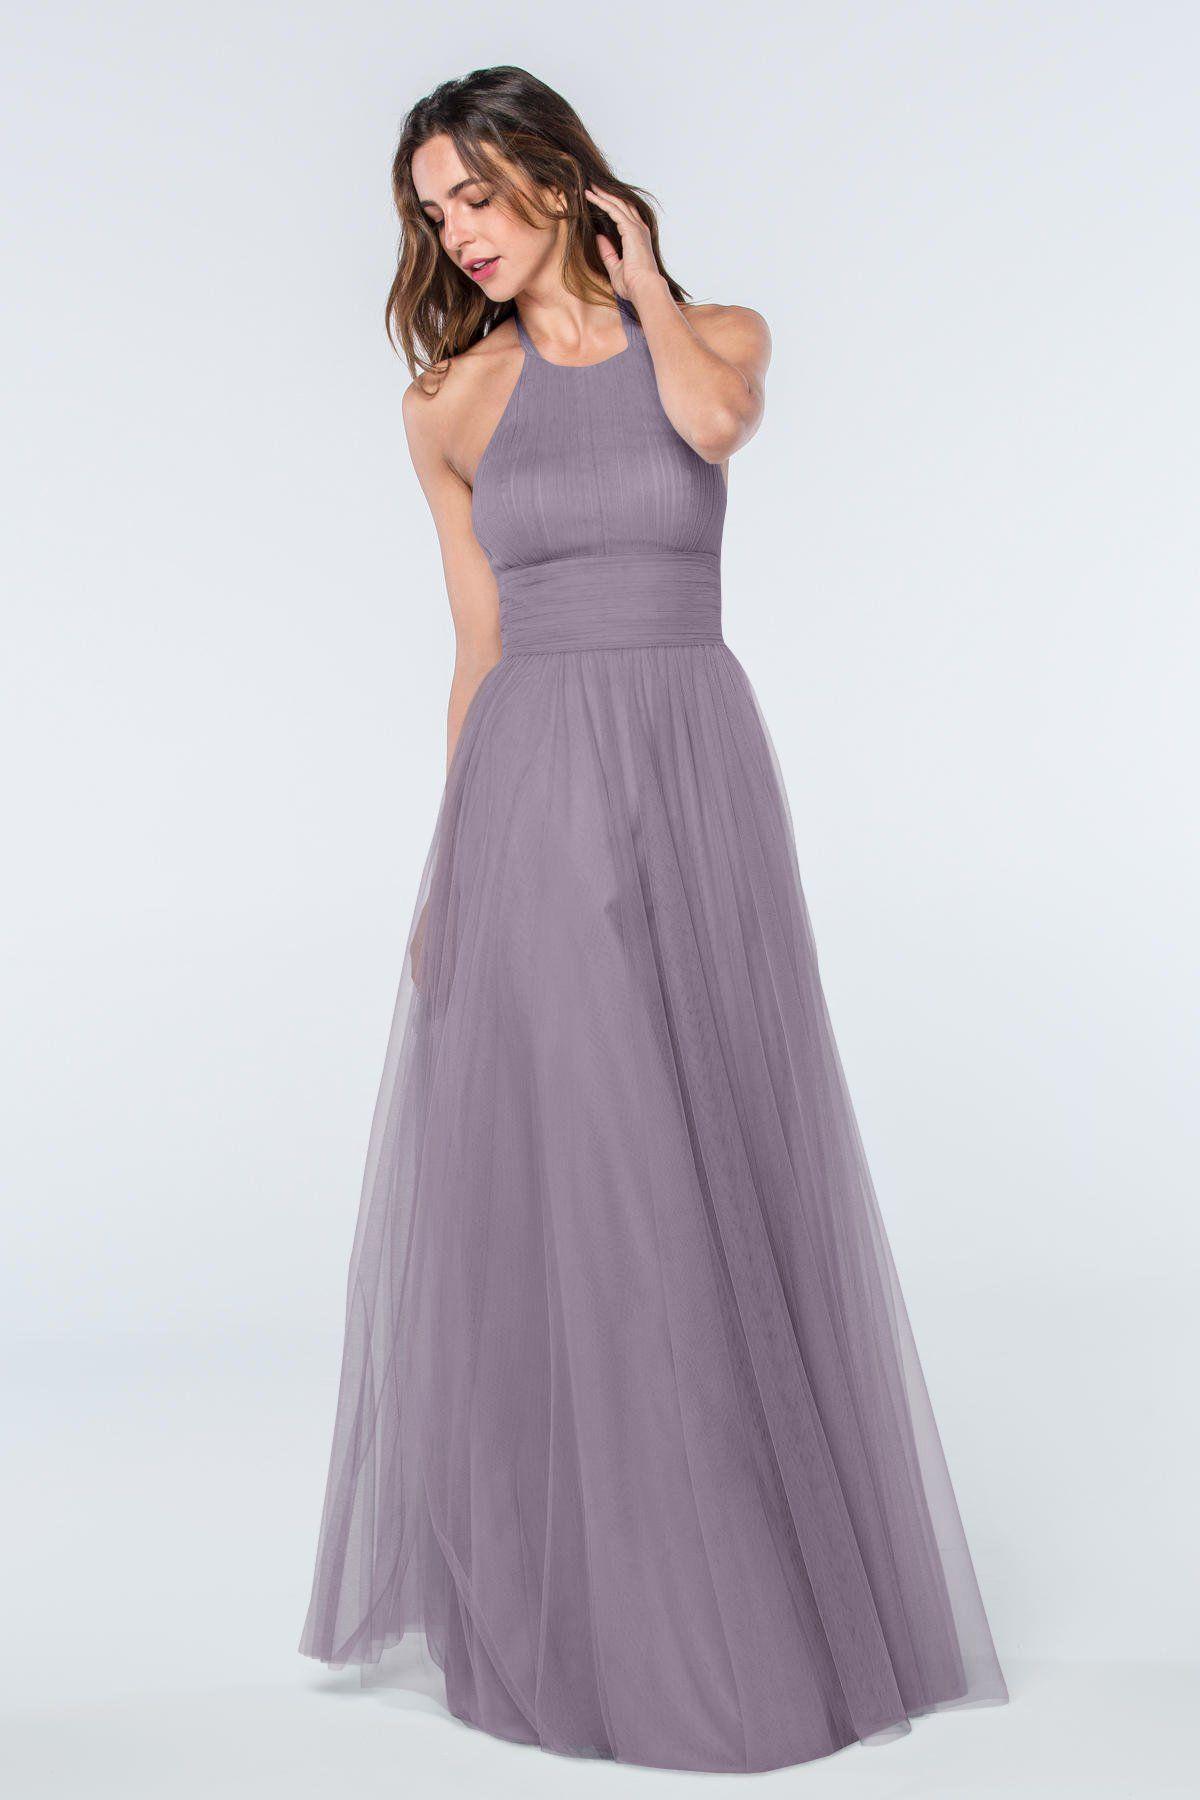 Watters heather my style pinterest bridesmaid bridesmaid